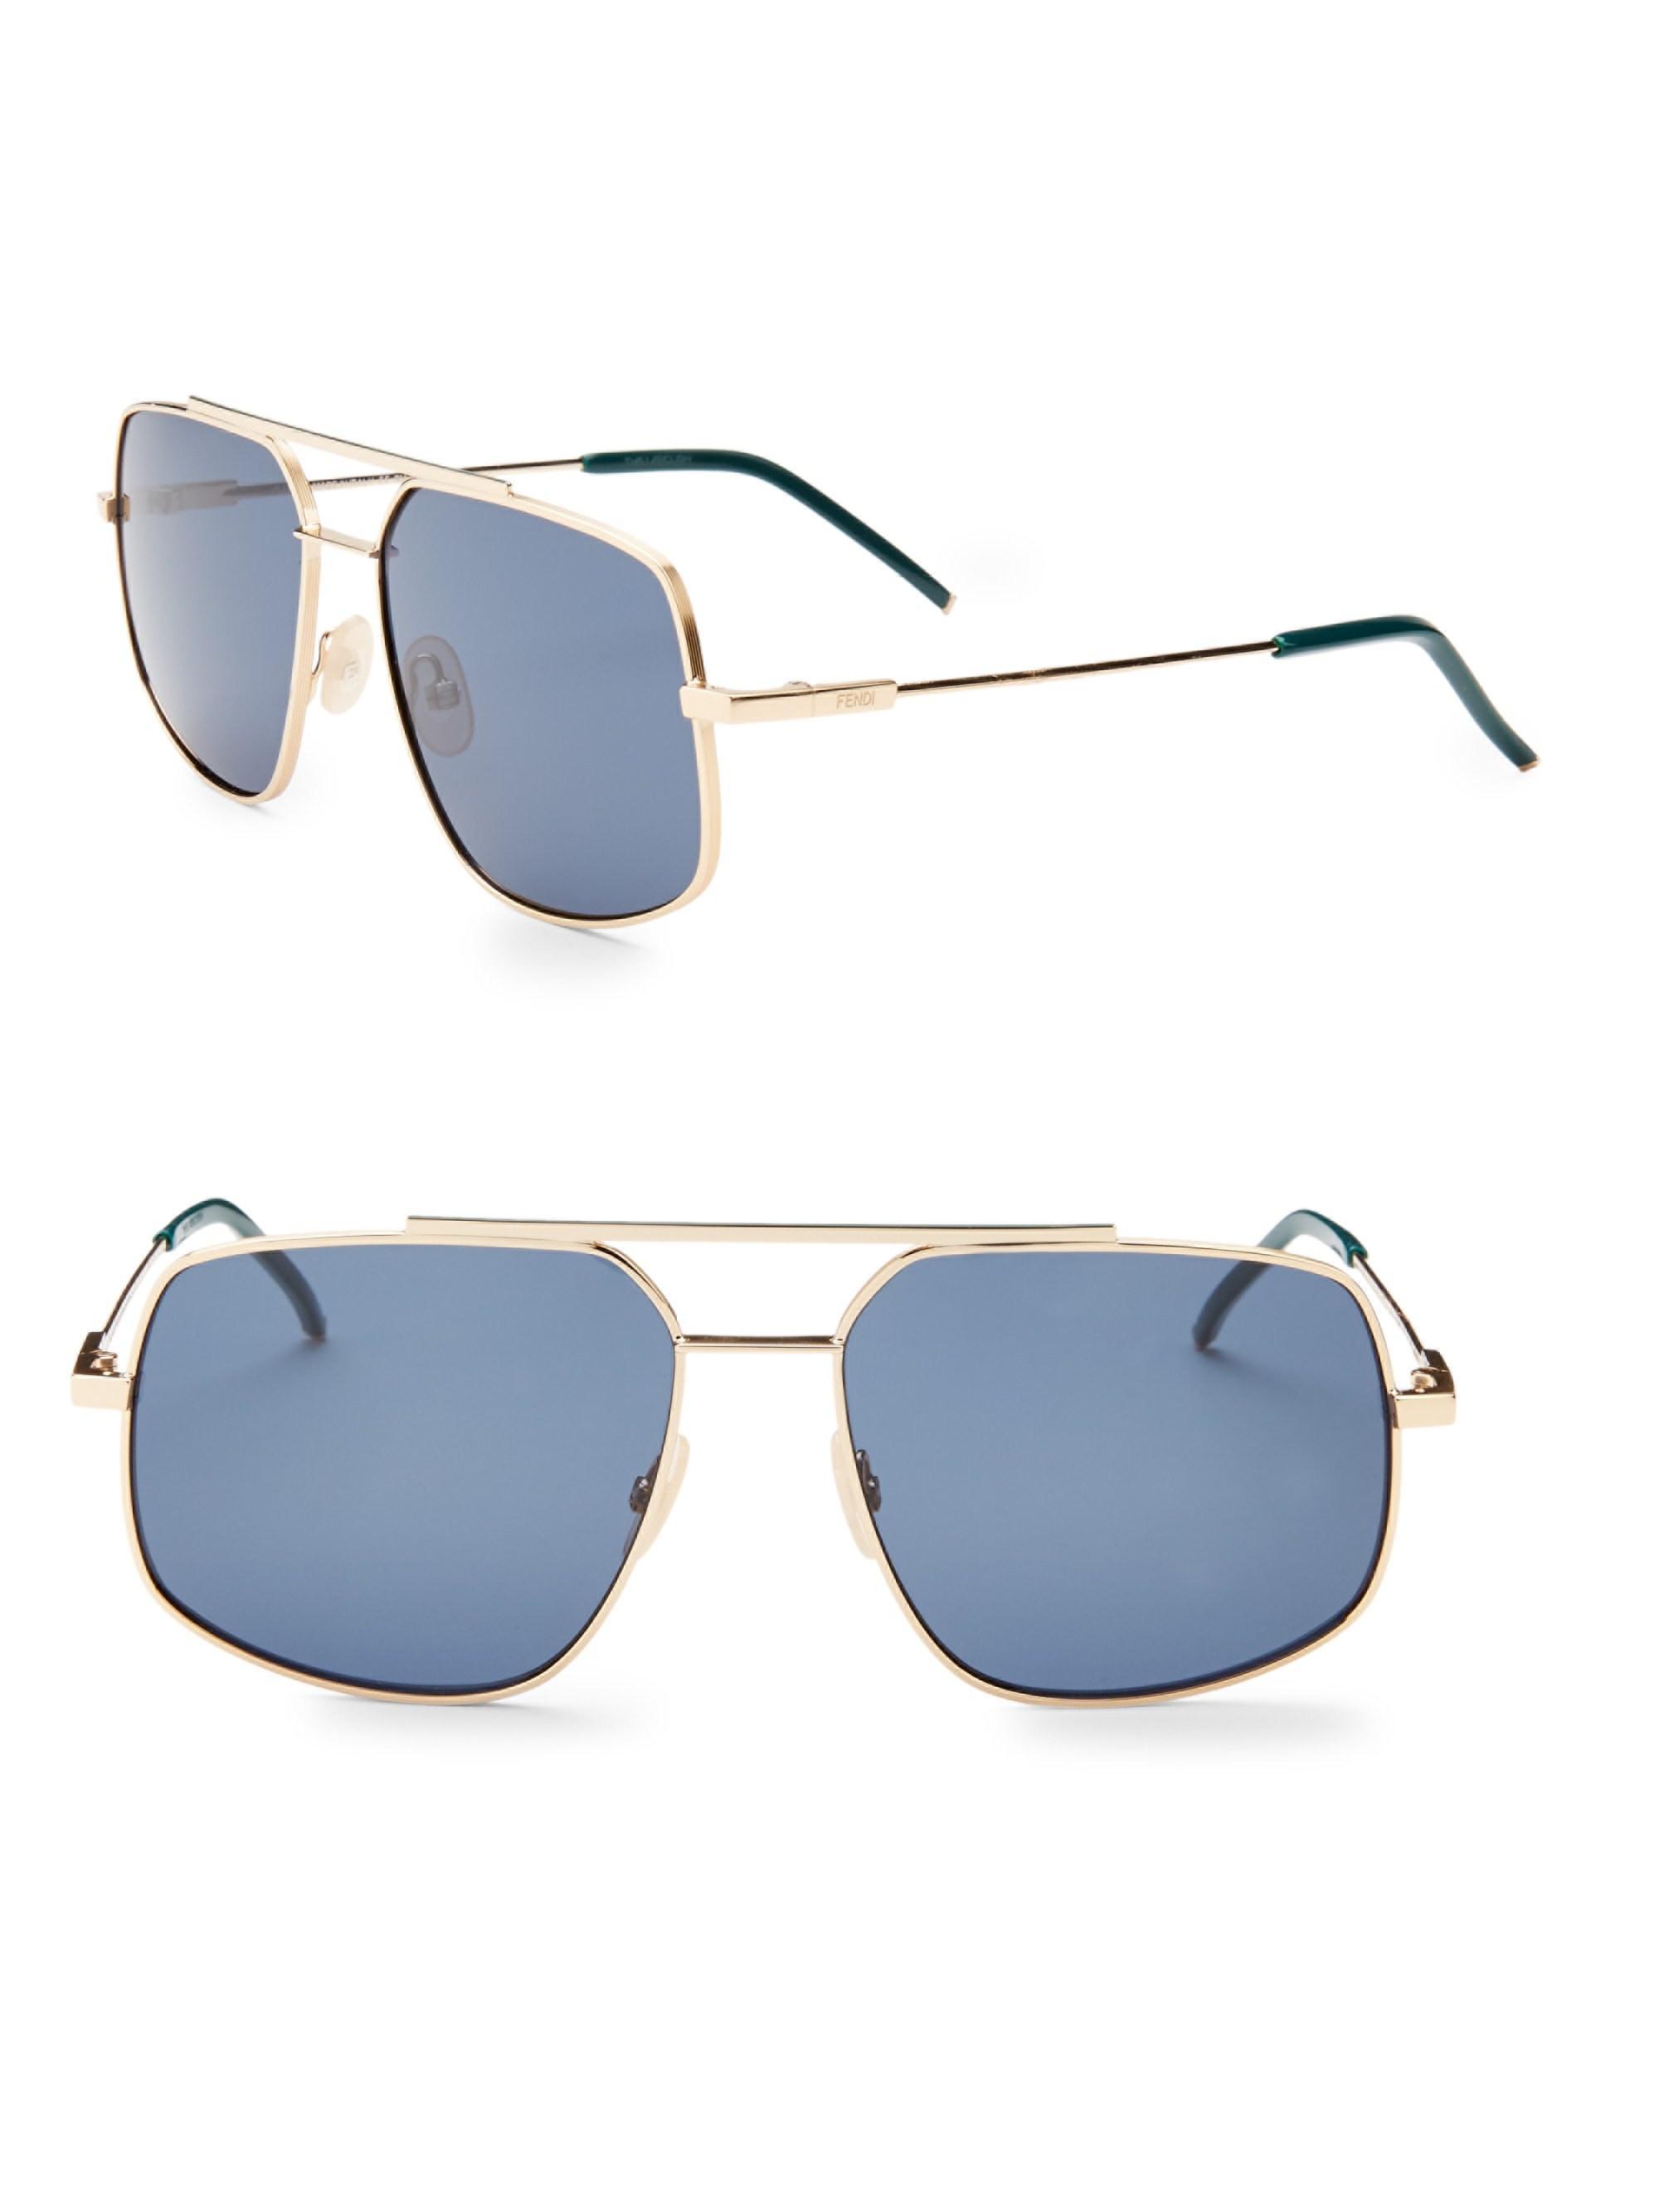 e7c652dbc85 Lyst - Fendi 58mm Square Sunglasses in Blue